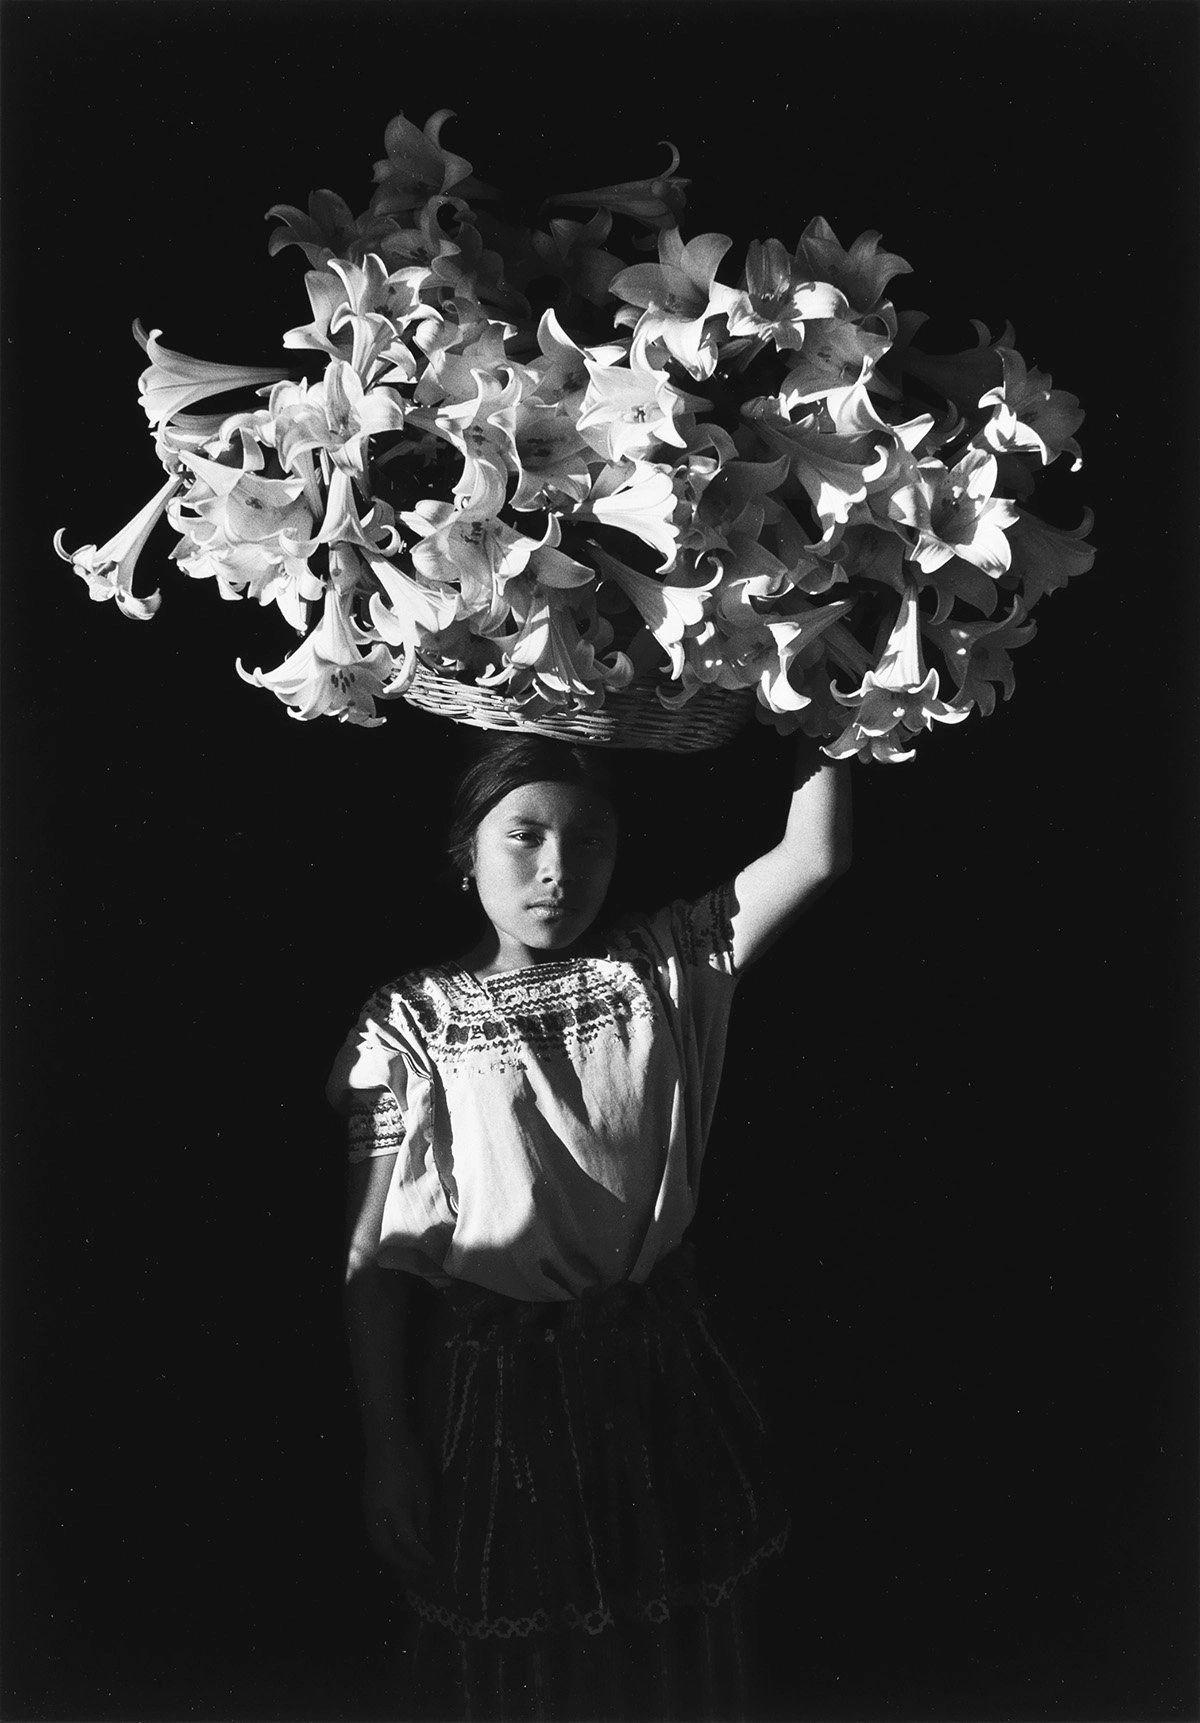 """Basket of Light ..."" by Flor Garduño"